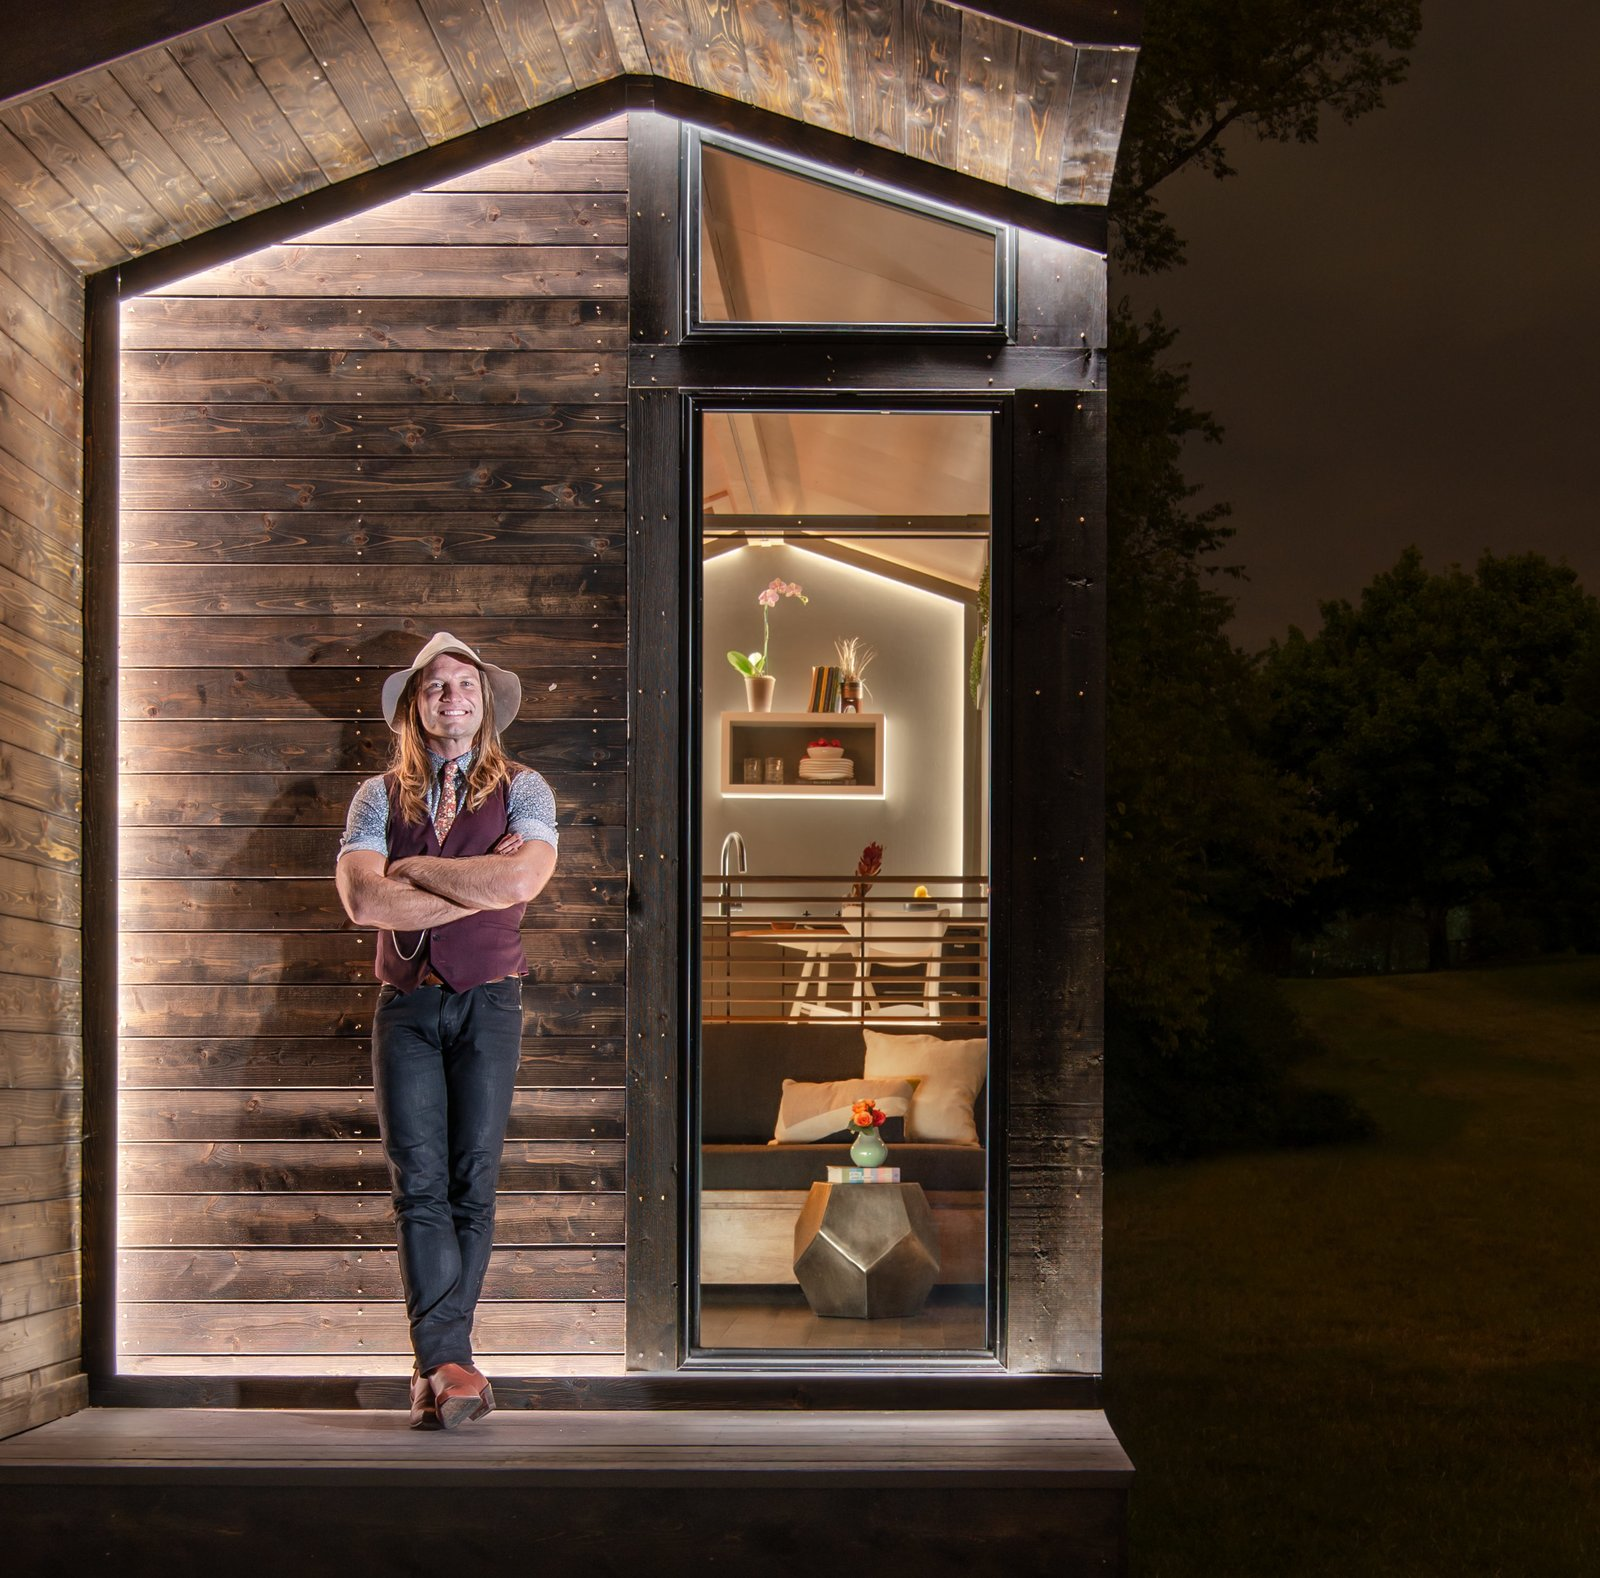 New Frontier Tiny Homes CEO David Latimer